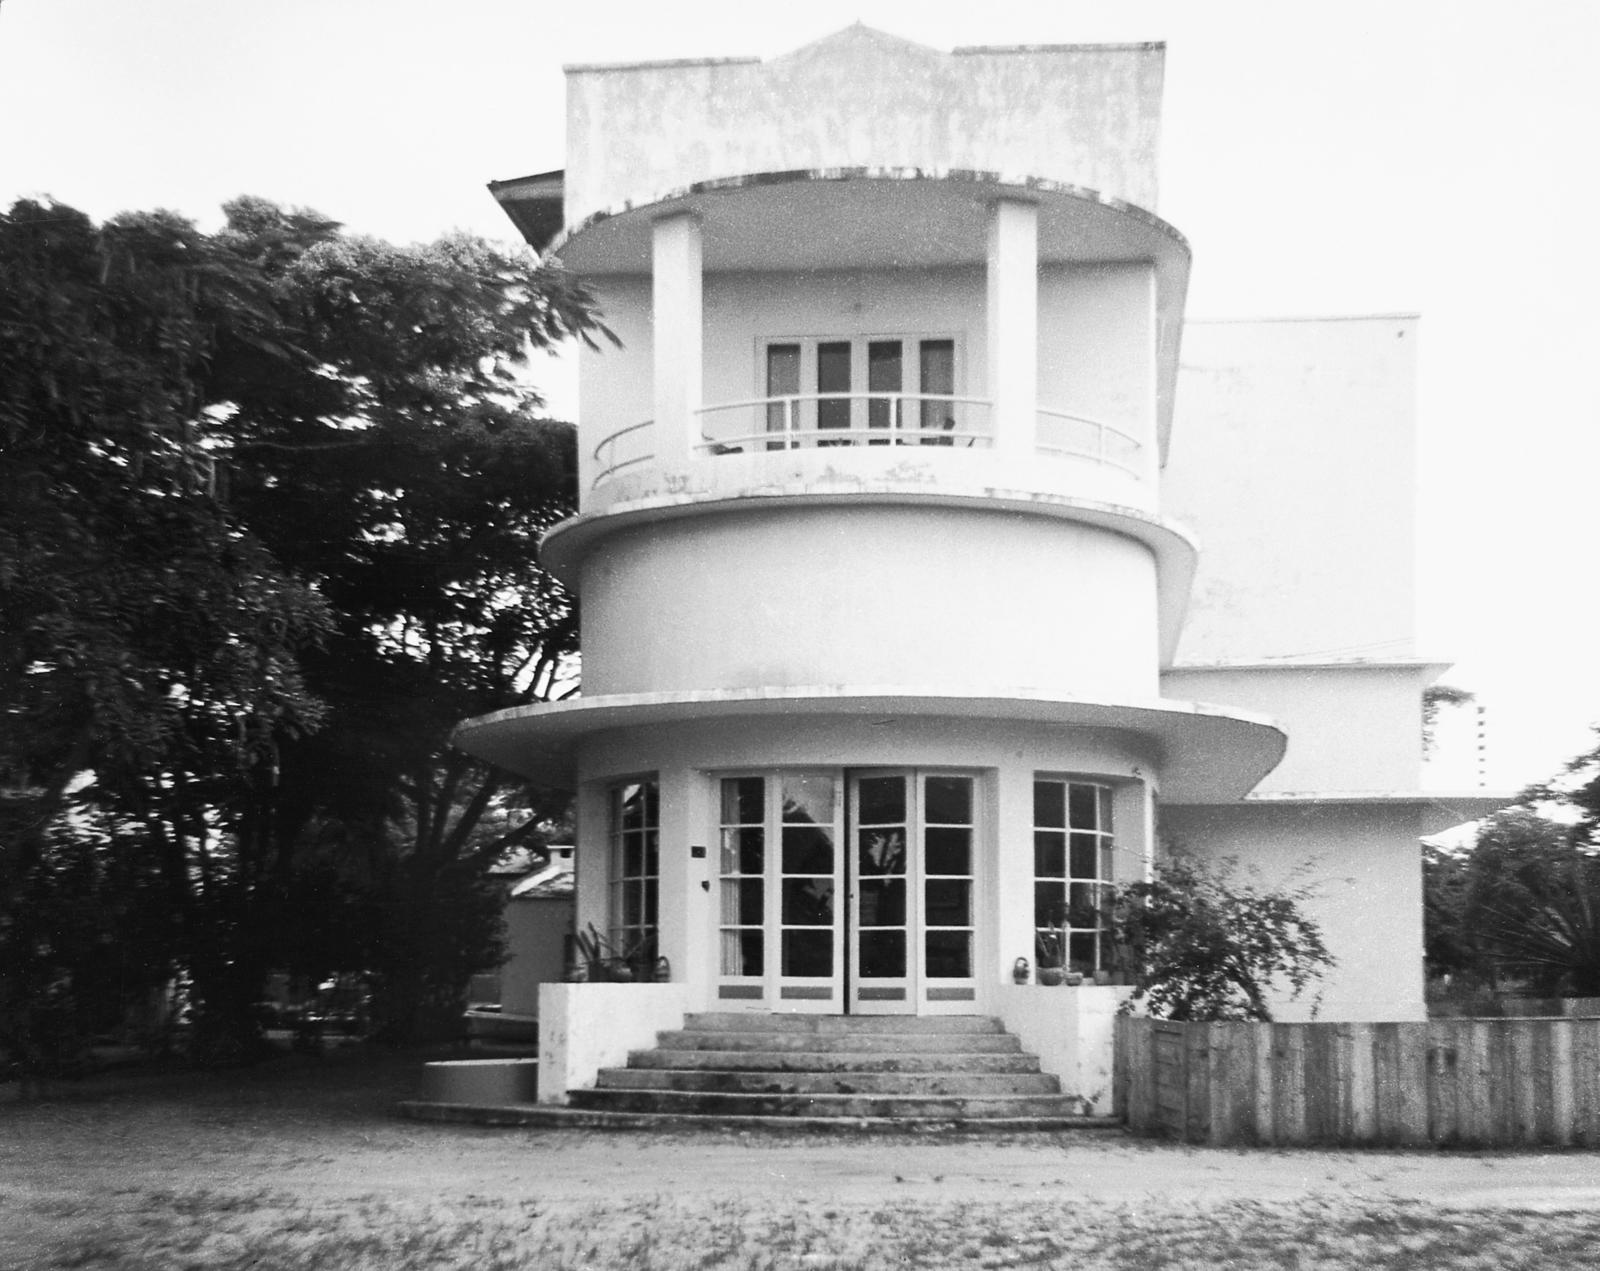 Brazzaville - Annex Office Building